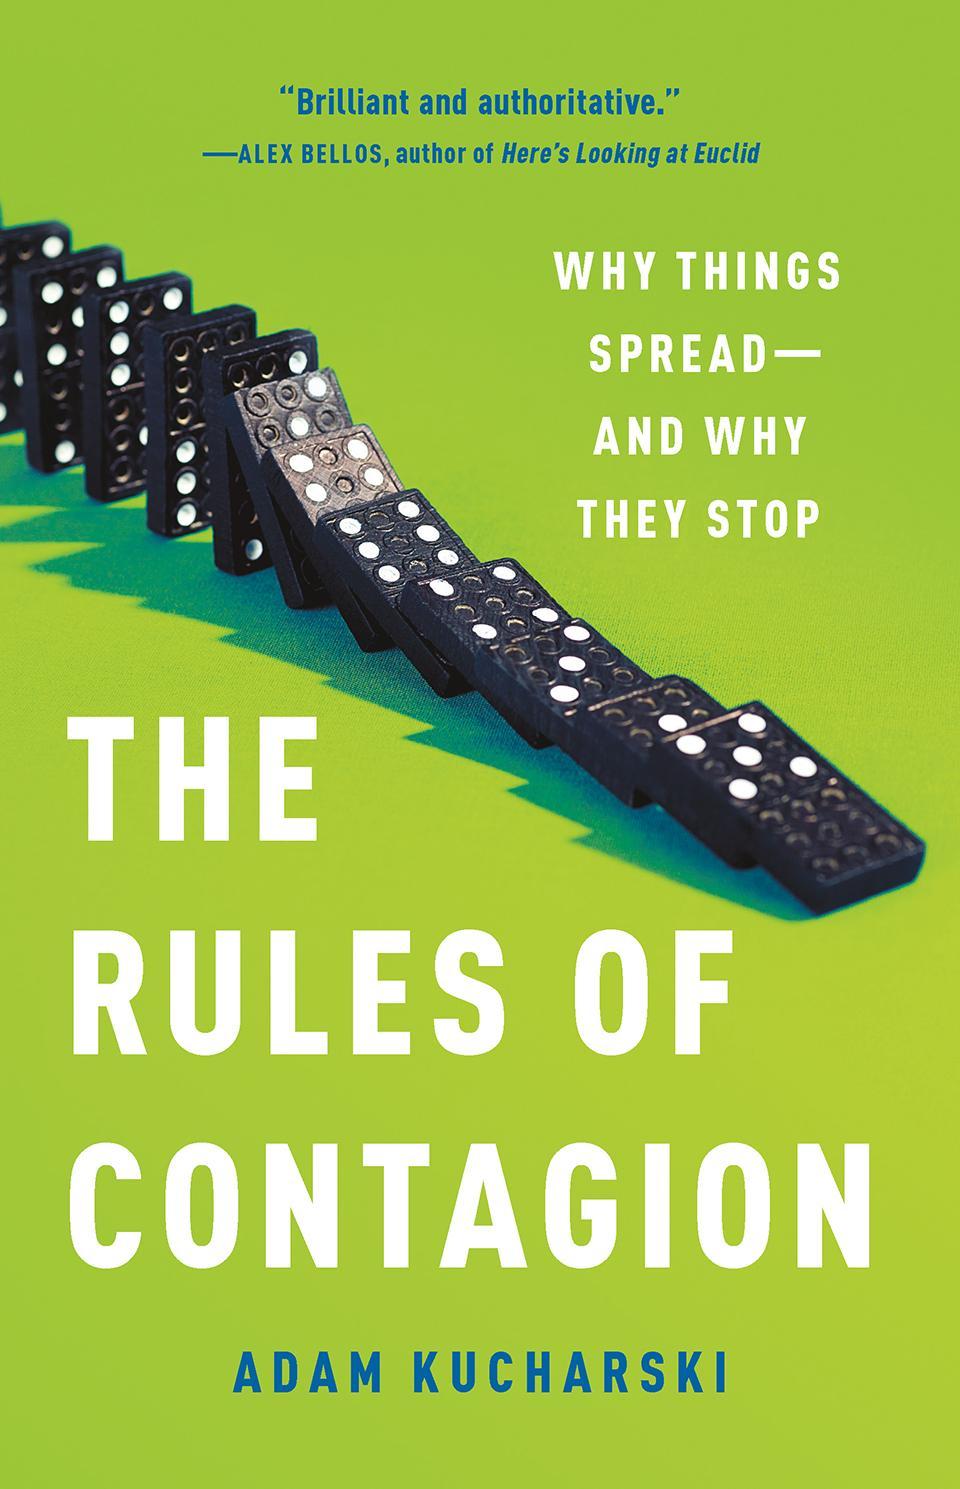 book-KUCHARSKI_The-Rules-Of-Contagion_300dpi